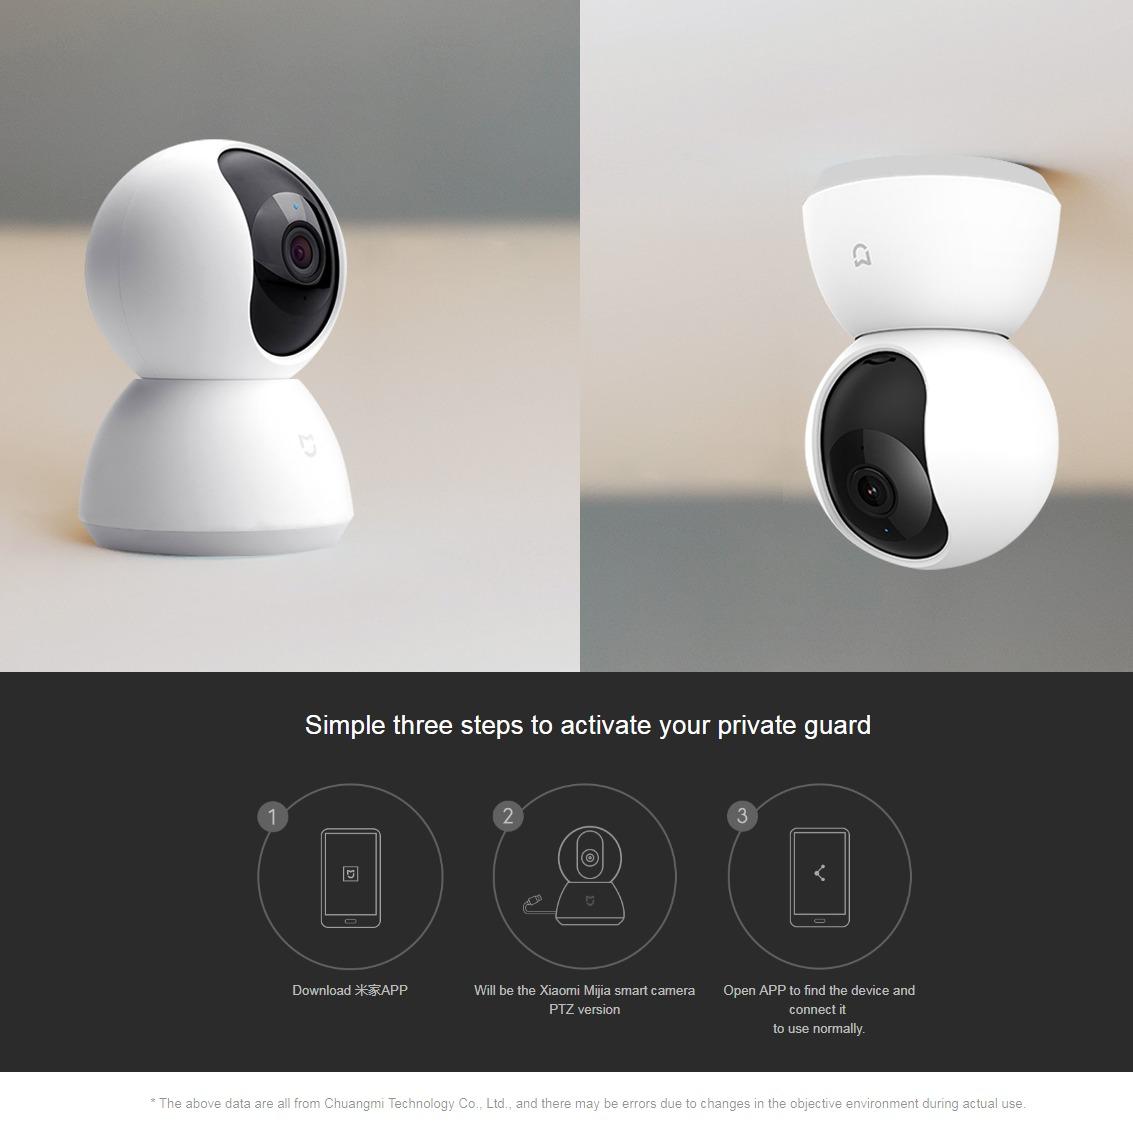 Xiaomi Mijia 360 Smart Camera PTZ 1080p (Updated Version)